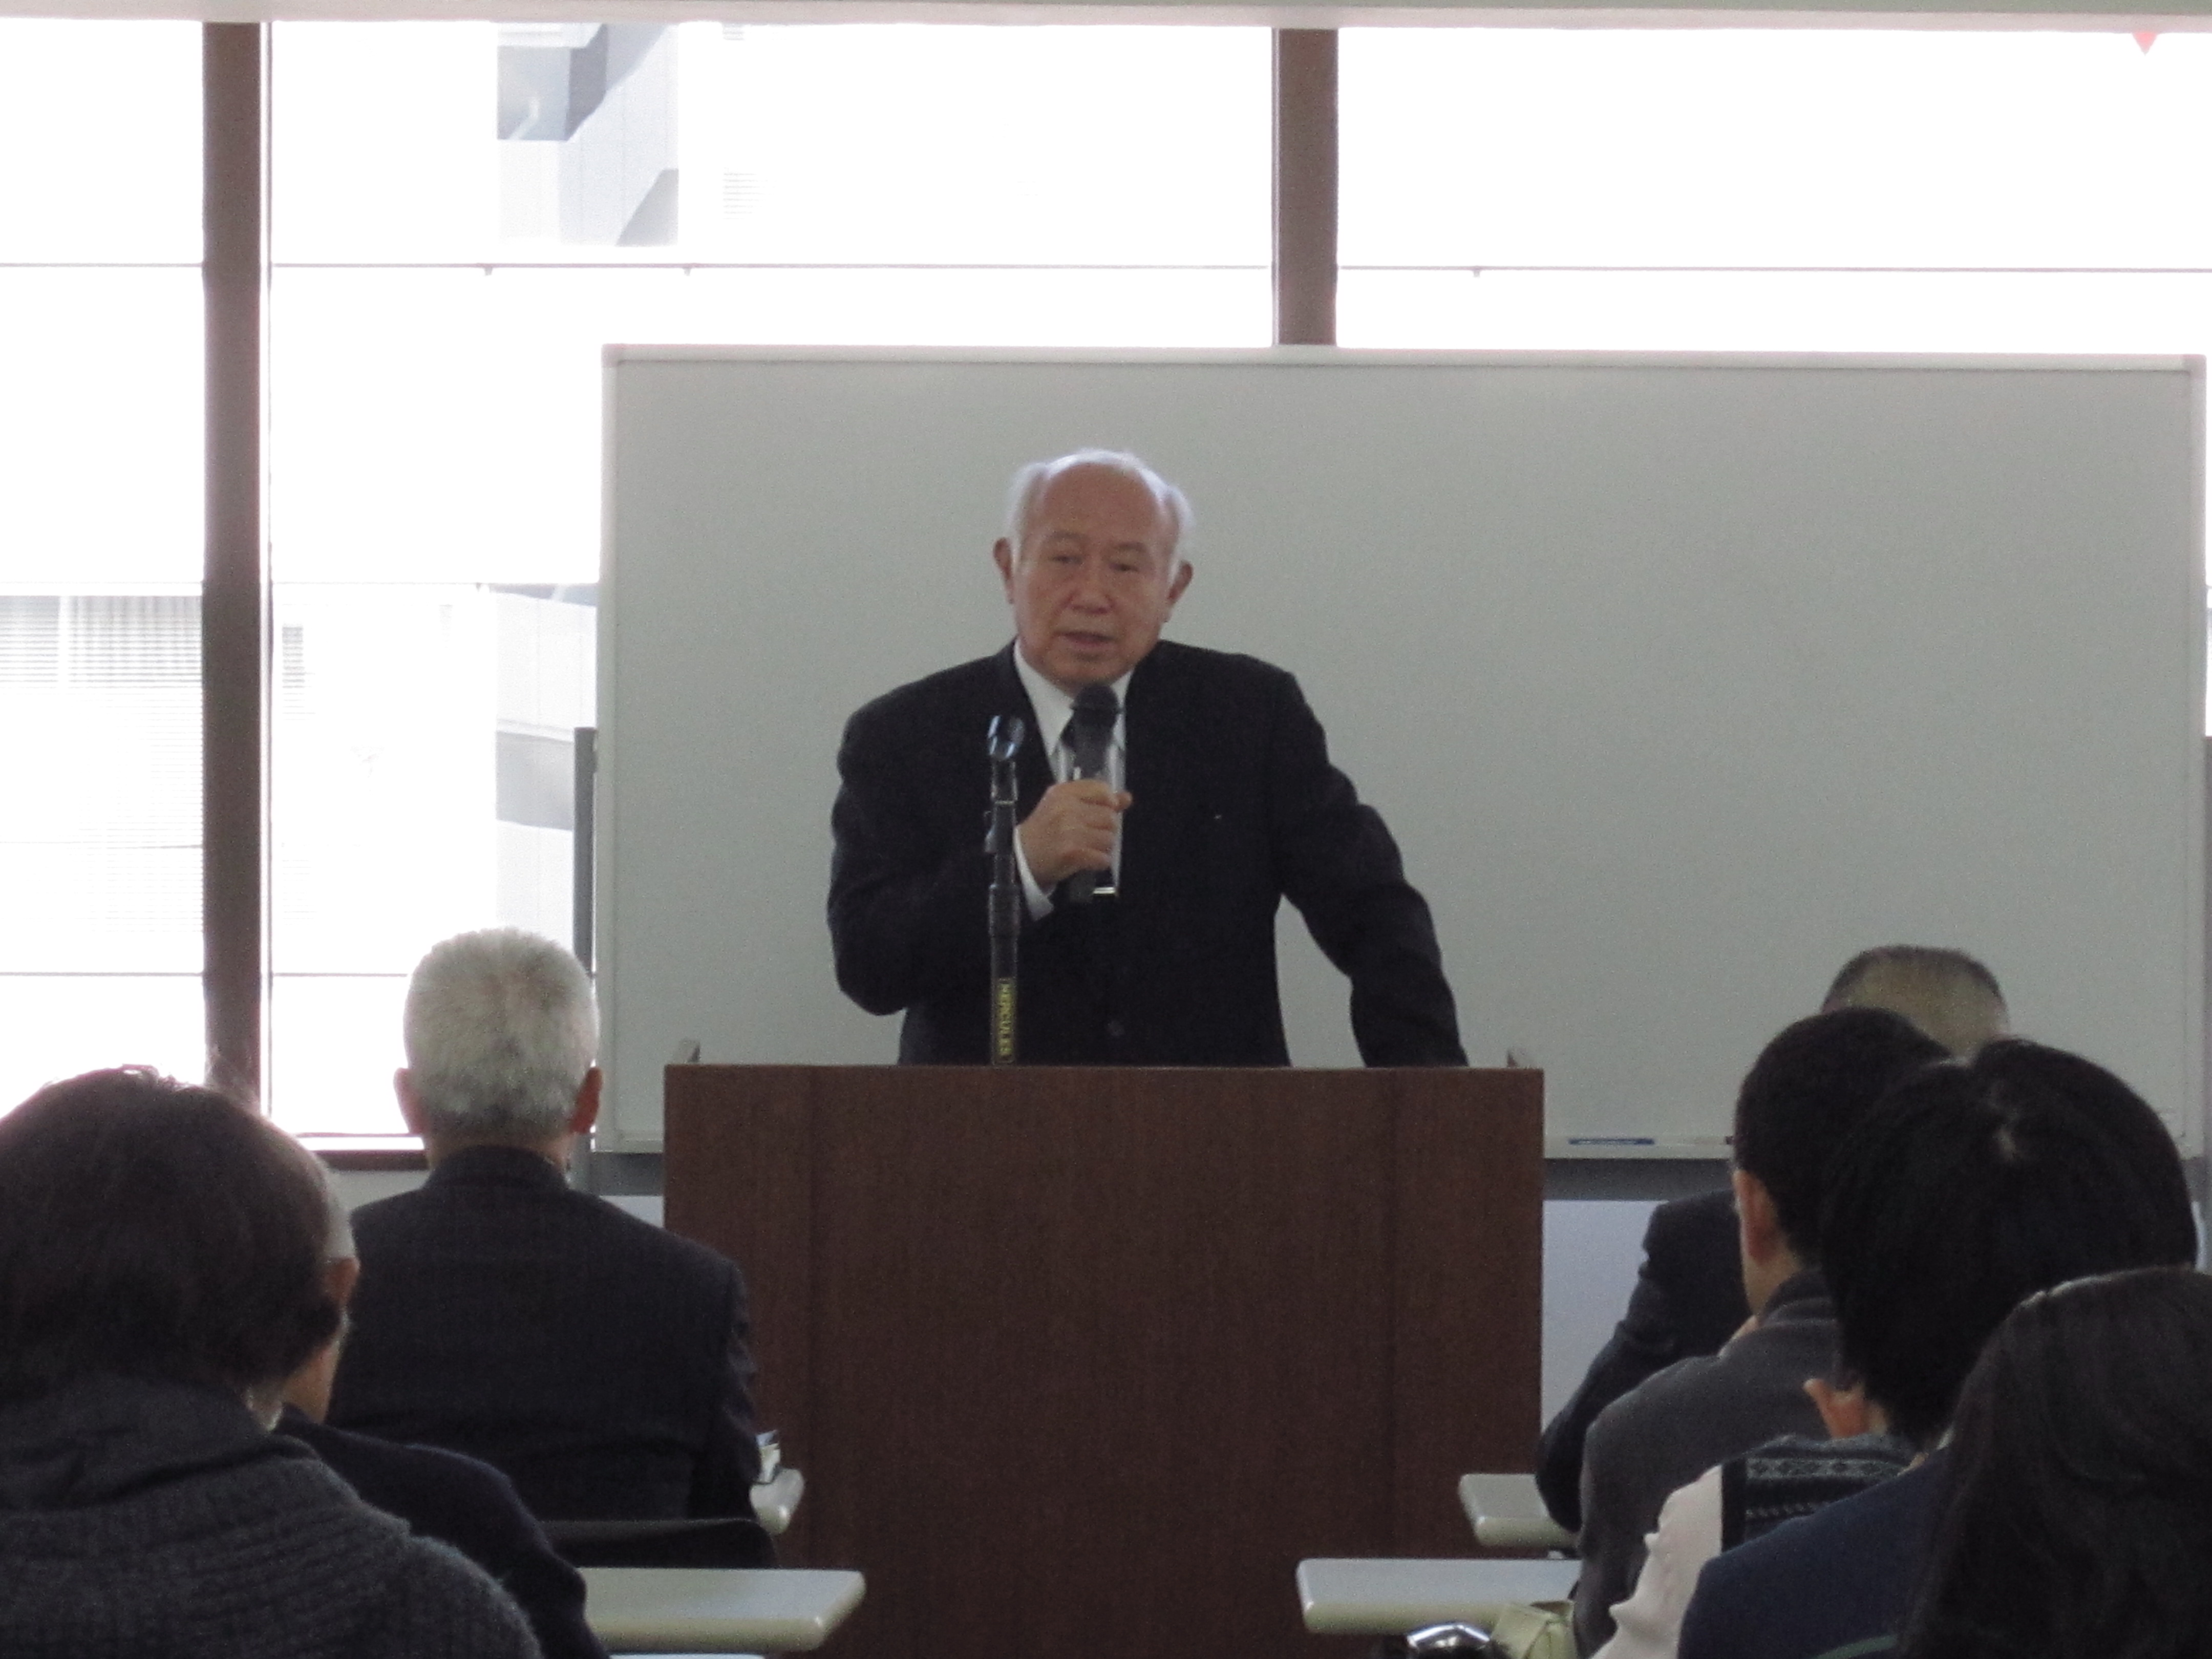 IMG 5598 - 4月1日東京思風塾の開催になります。